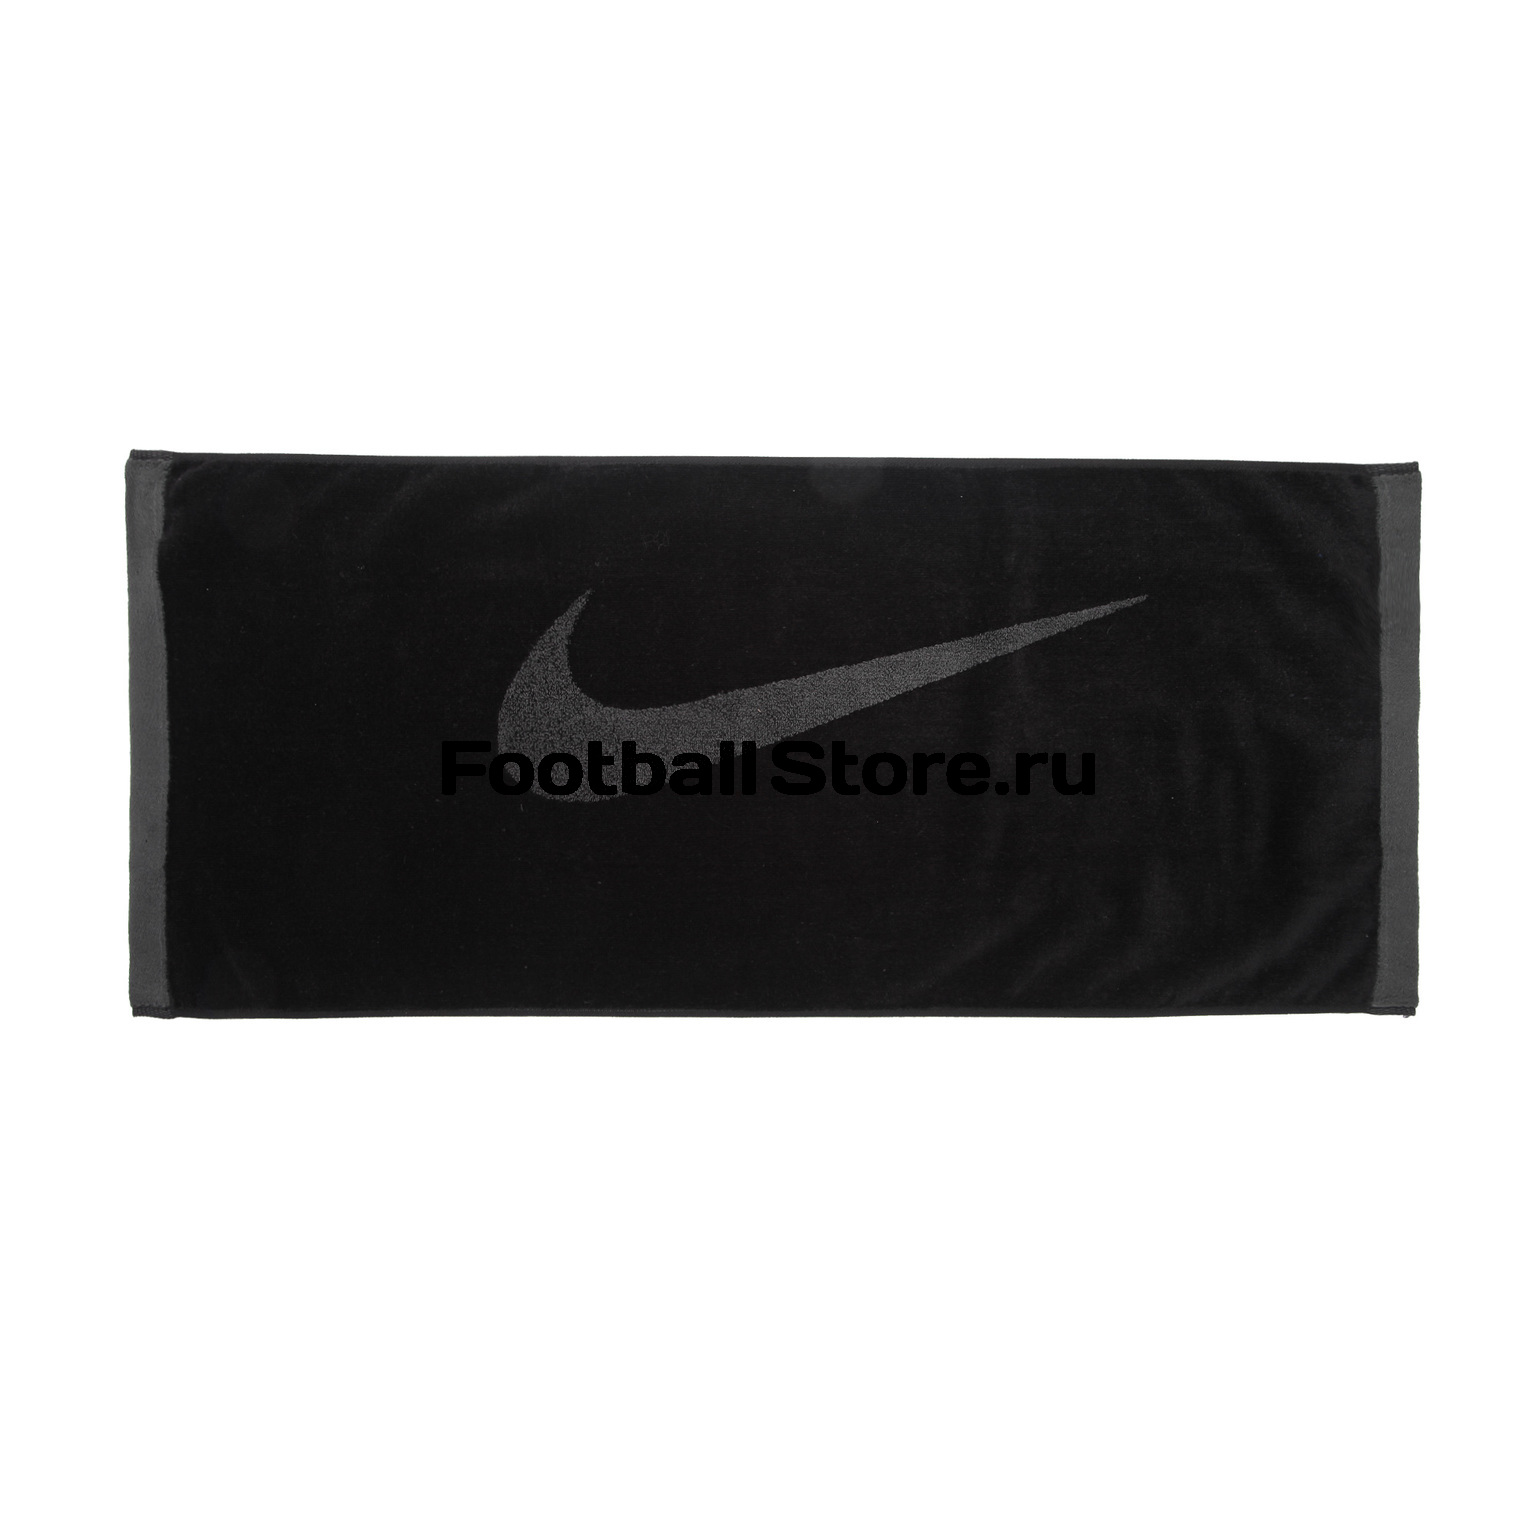 Полотенце Nike Sport Towel N.ET.13.046.LG ceramic oil rubbed bronze crystal hanger towel rack holder single towel bar new